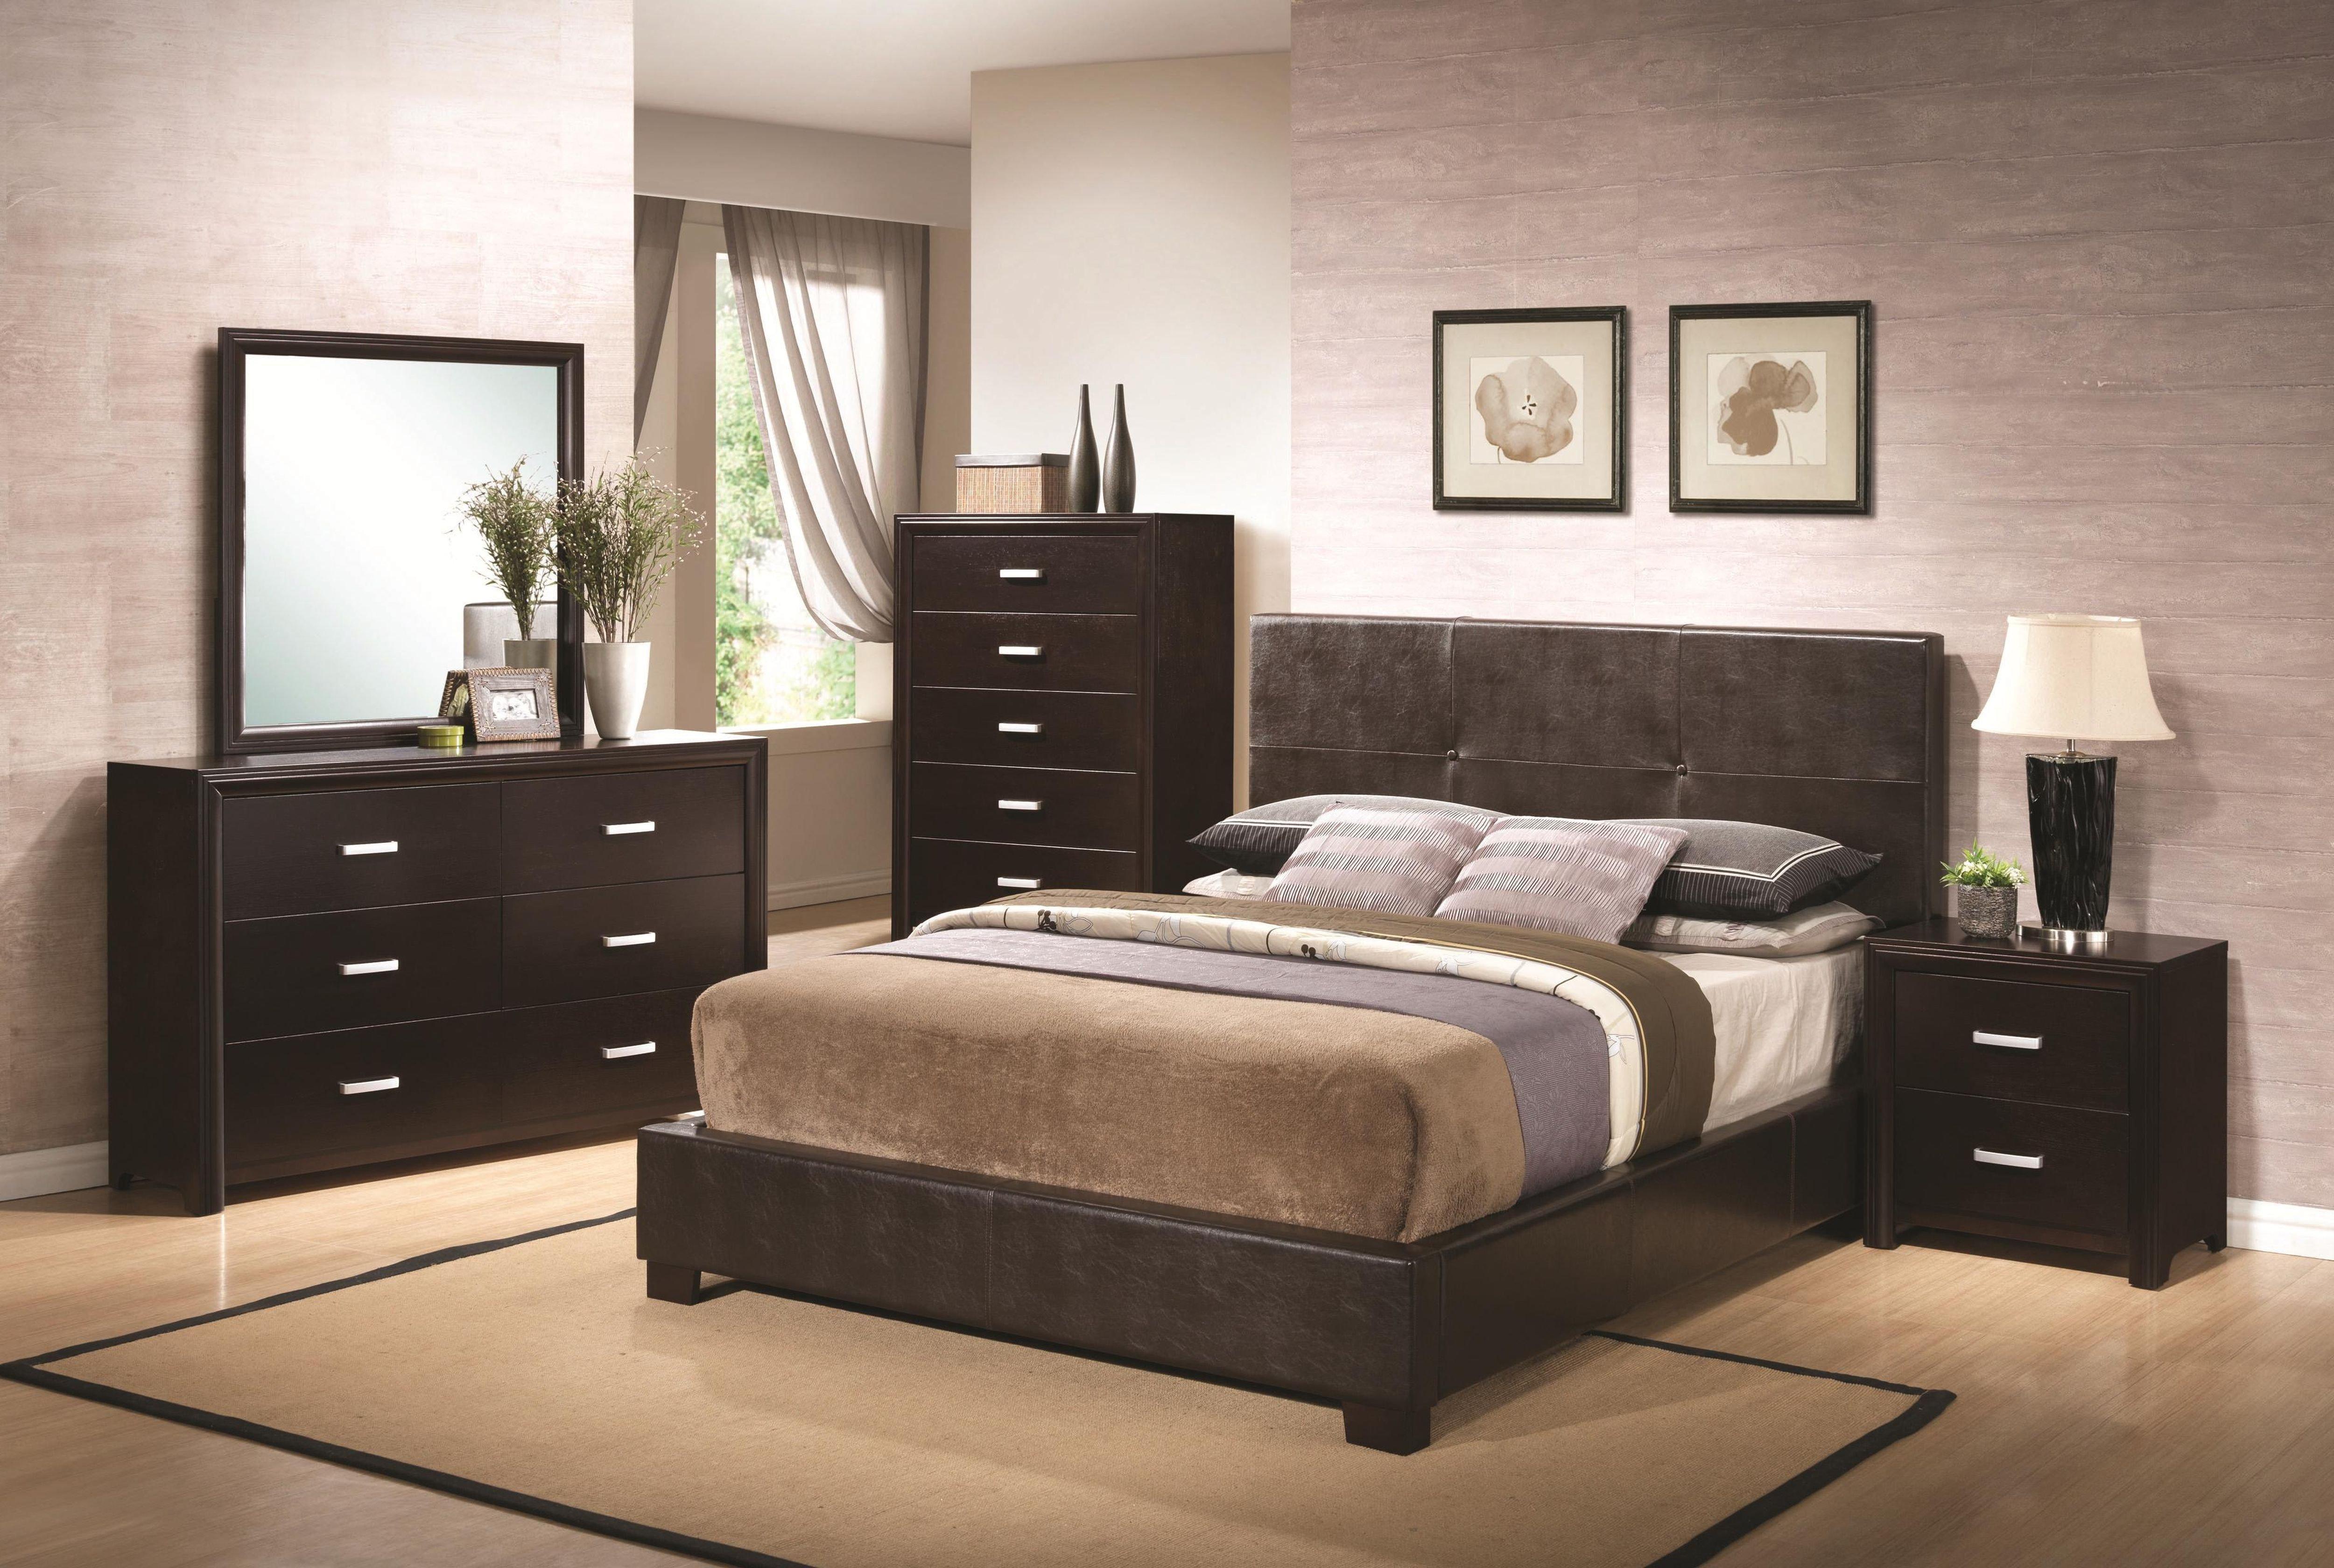 King Bedroom Set Ikea Inspirational Pin by northernstarlite On Bedroom